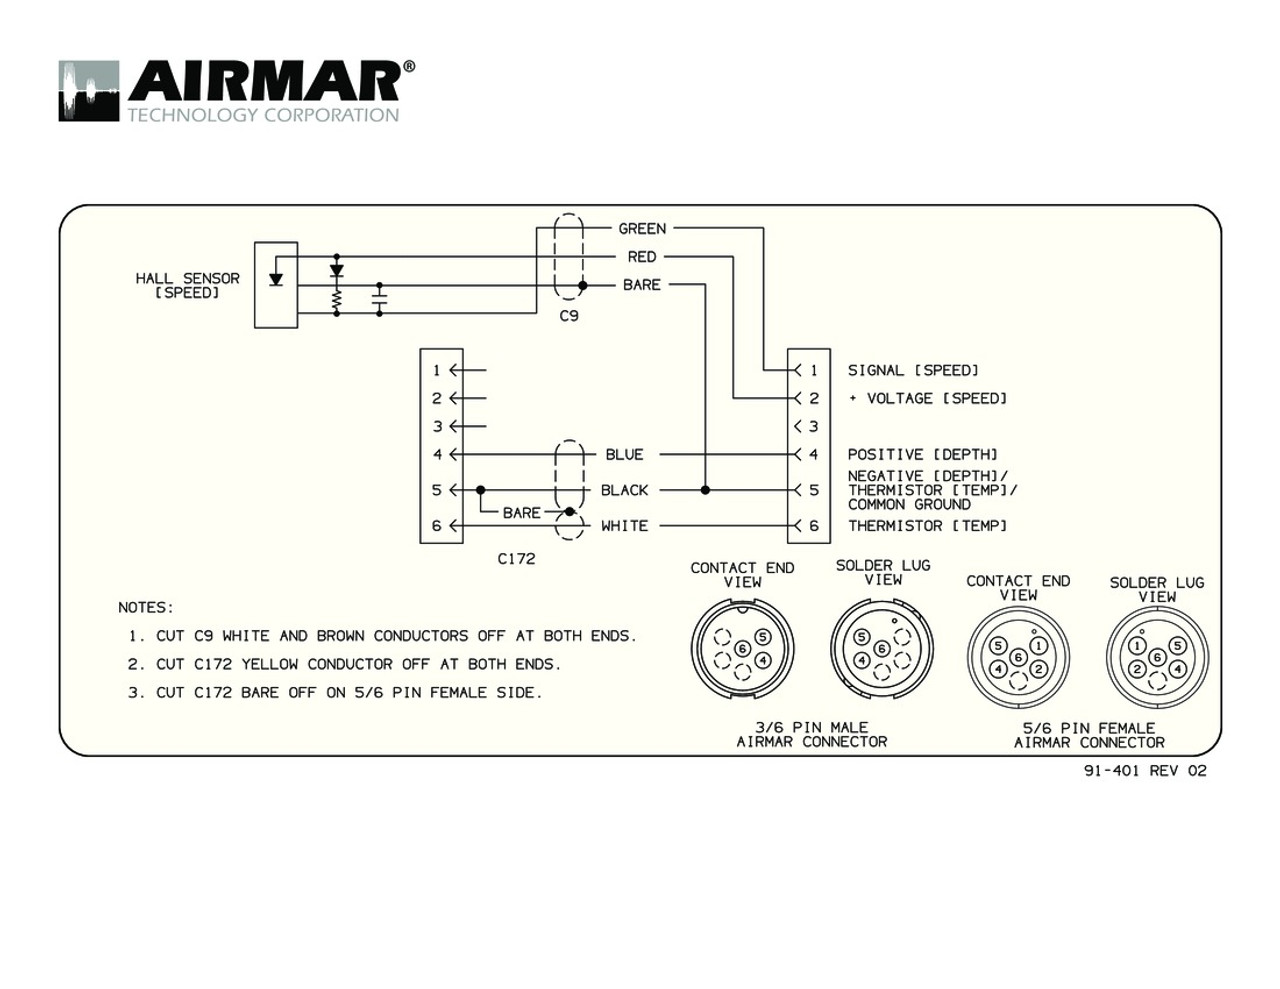 airmar transducer wiring diagrams 90cc pit bike diagram garmin fishfinder online